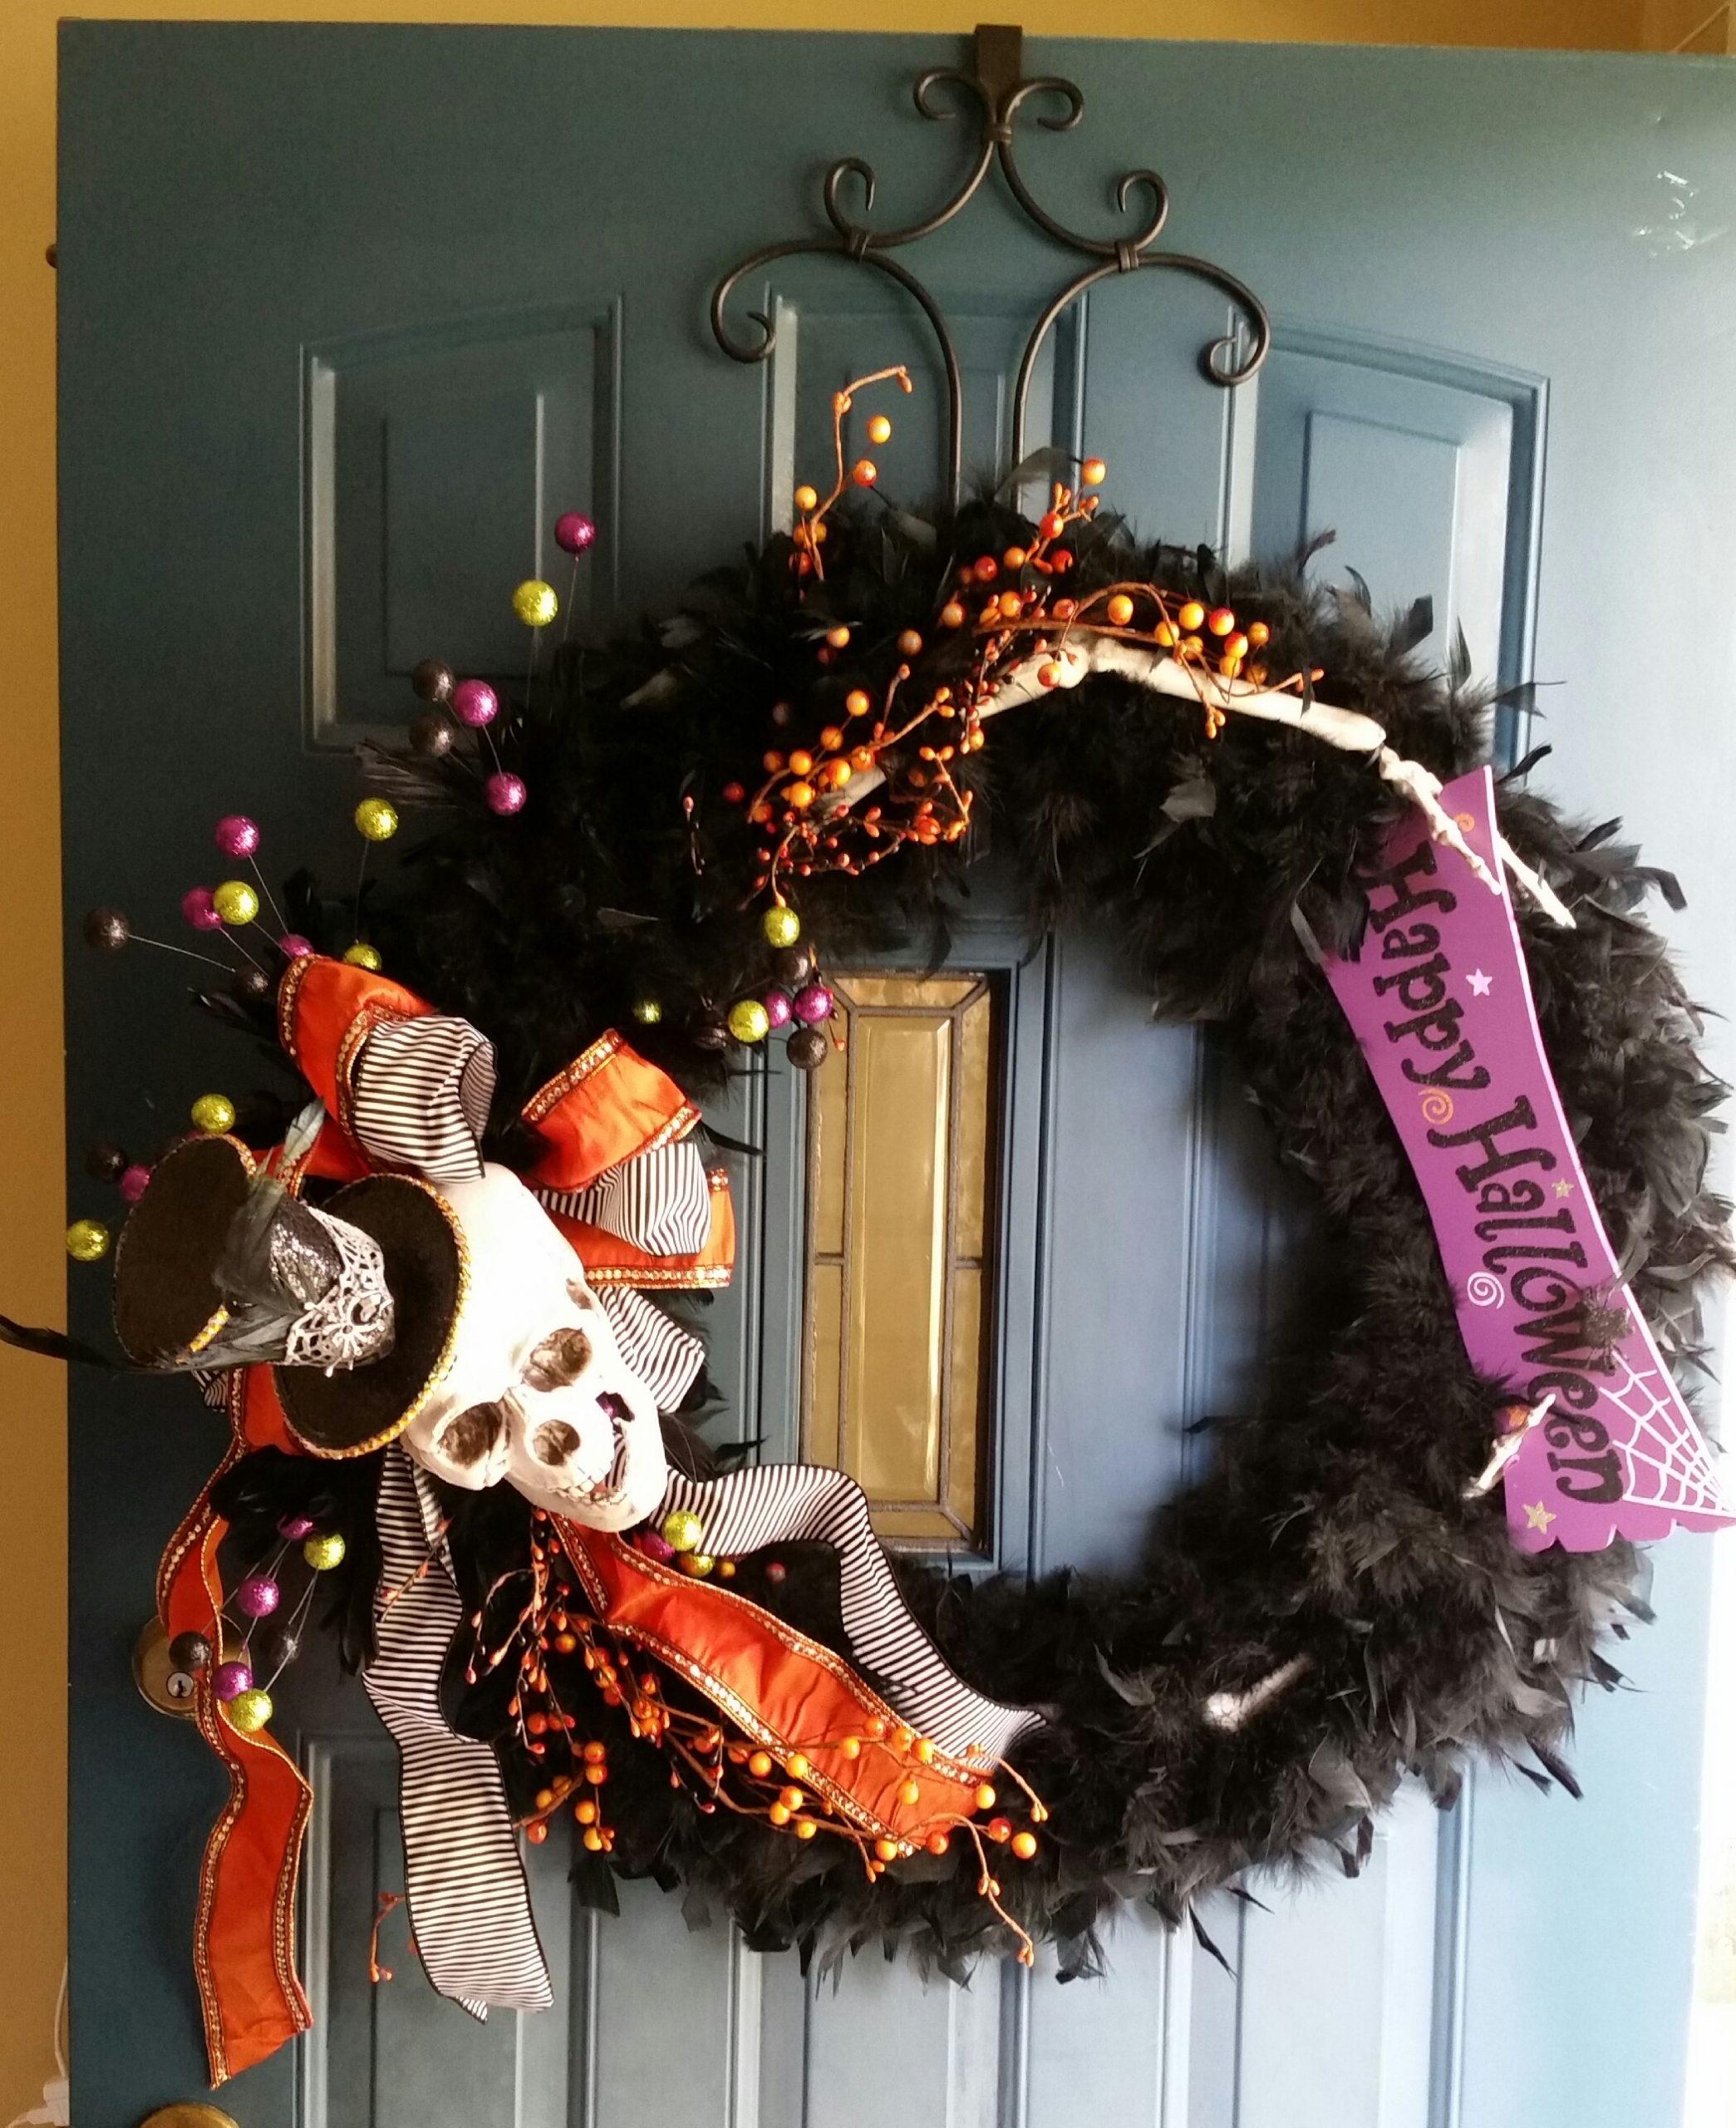 Mo's wreath